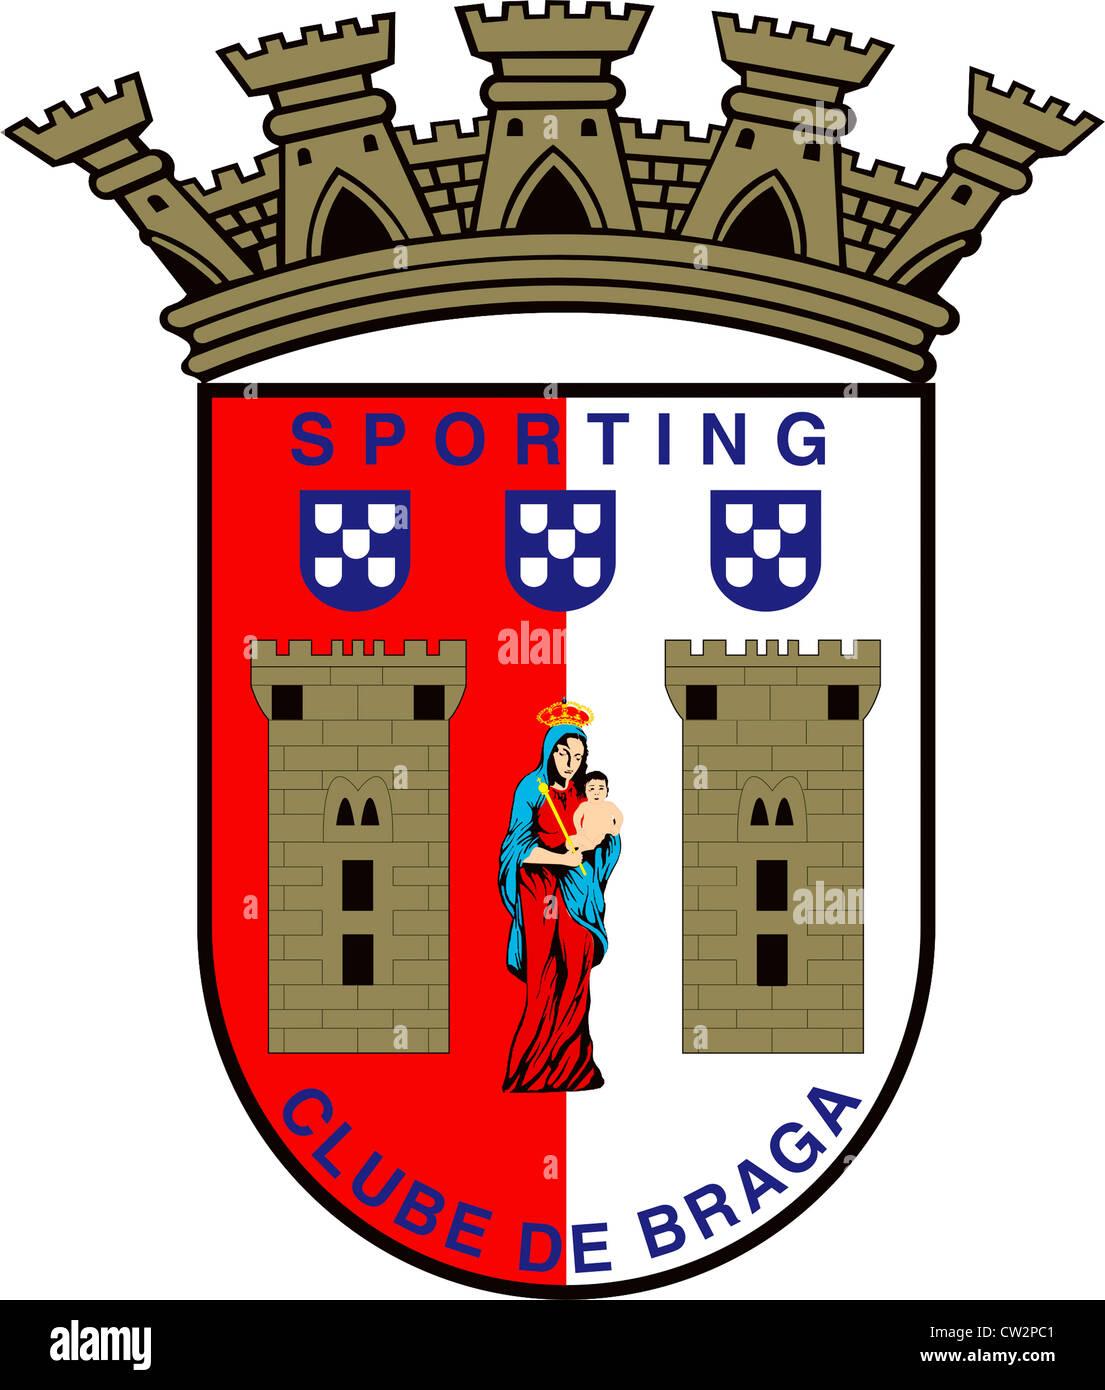 Logo of Portuguese football team Sporting Clube de Braga. - Stock Image